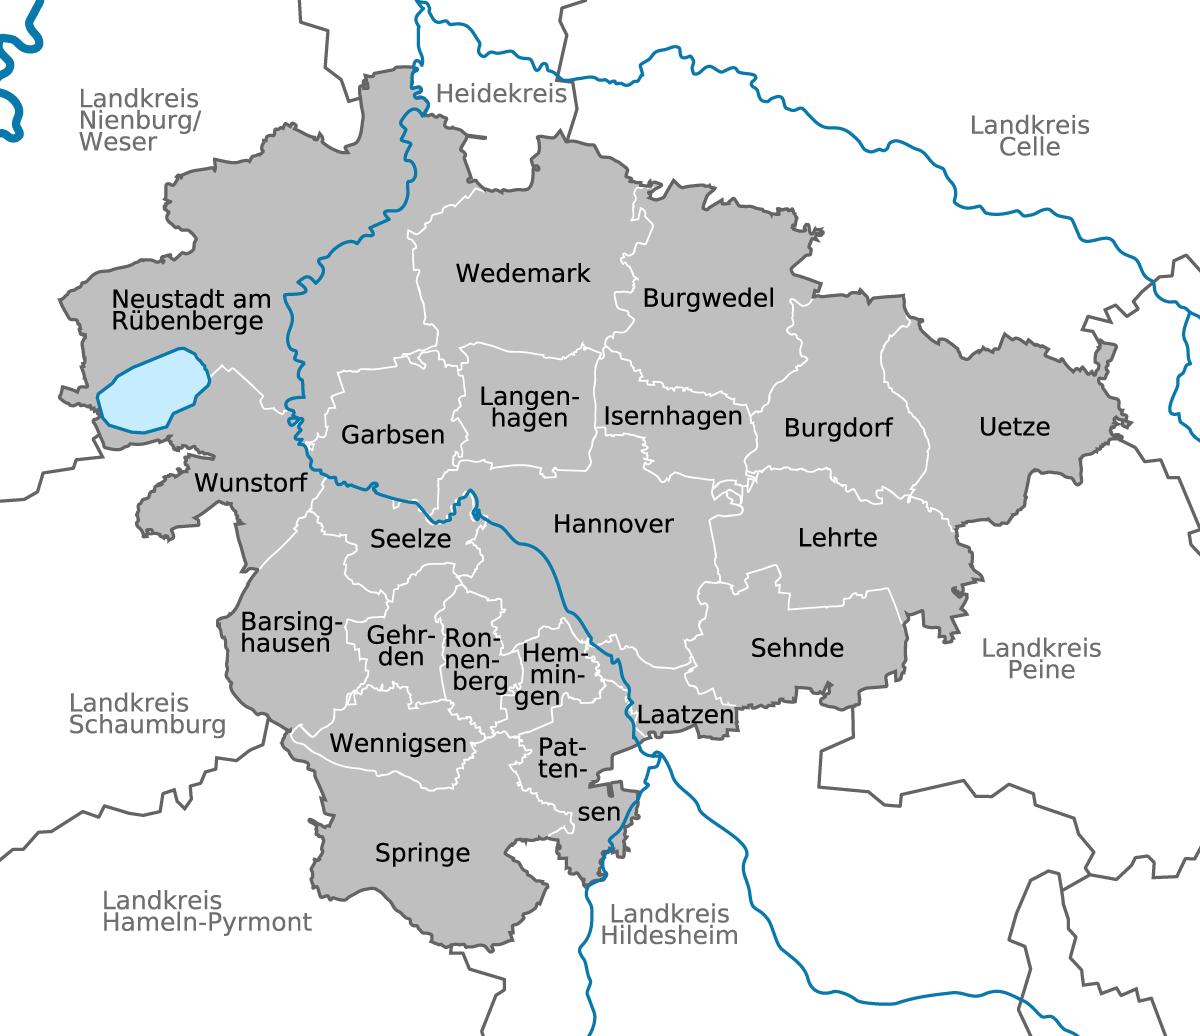 Kreis Hannover Land